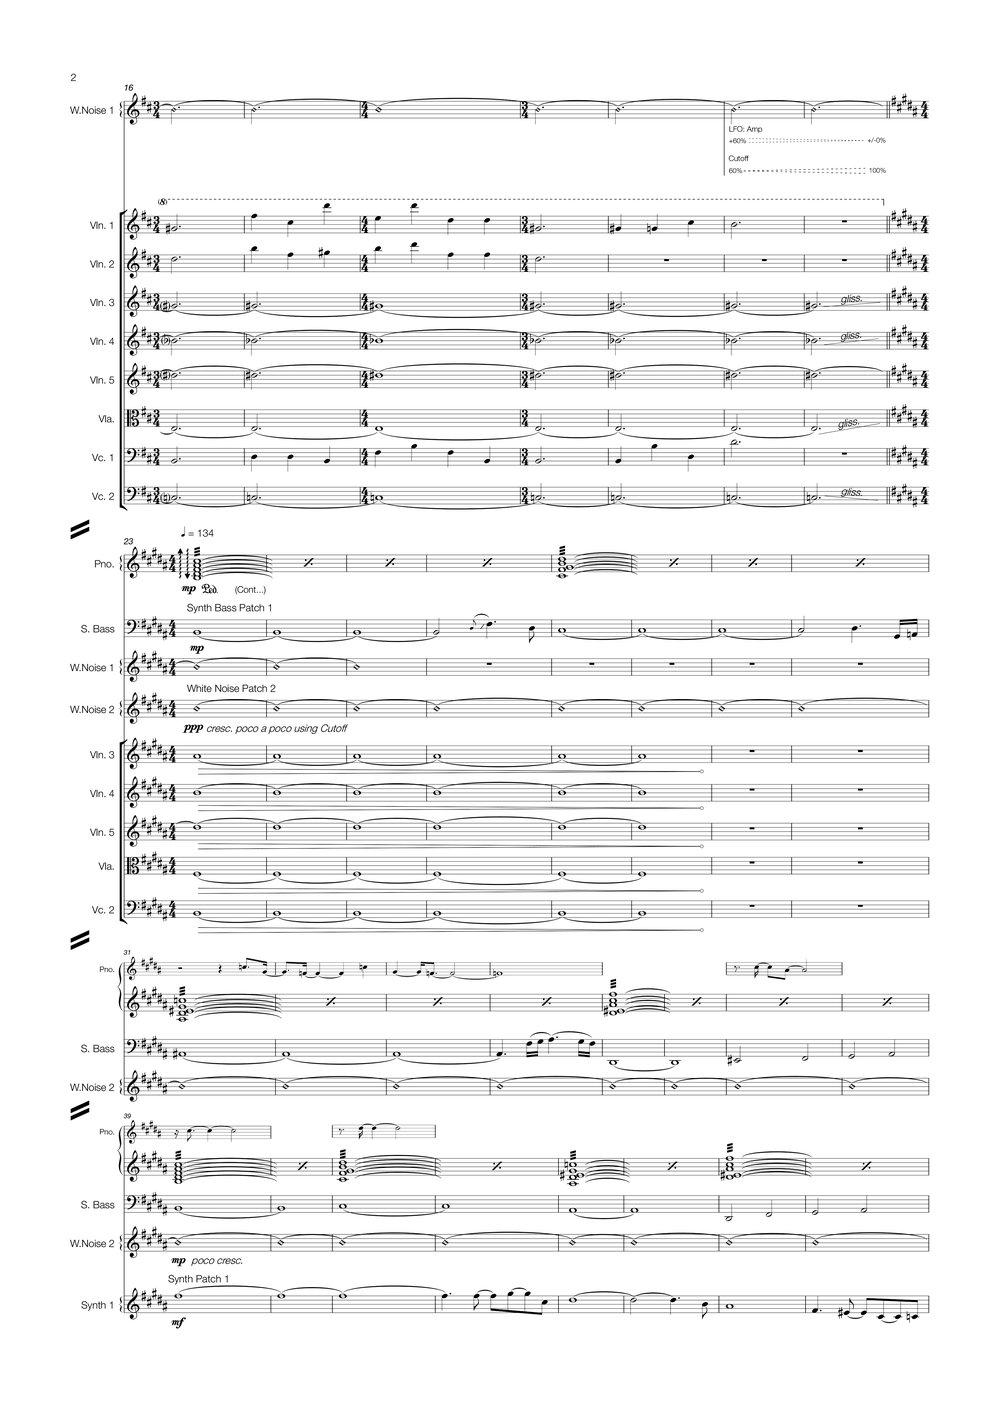 Elliptically Elliptical Score Page 4.jpg